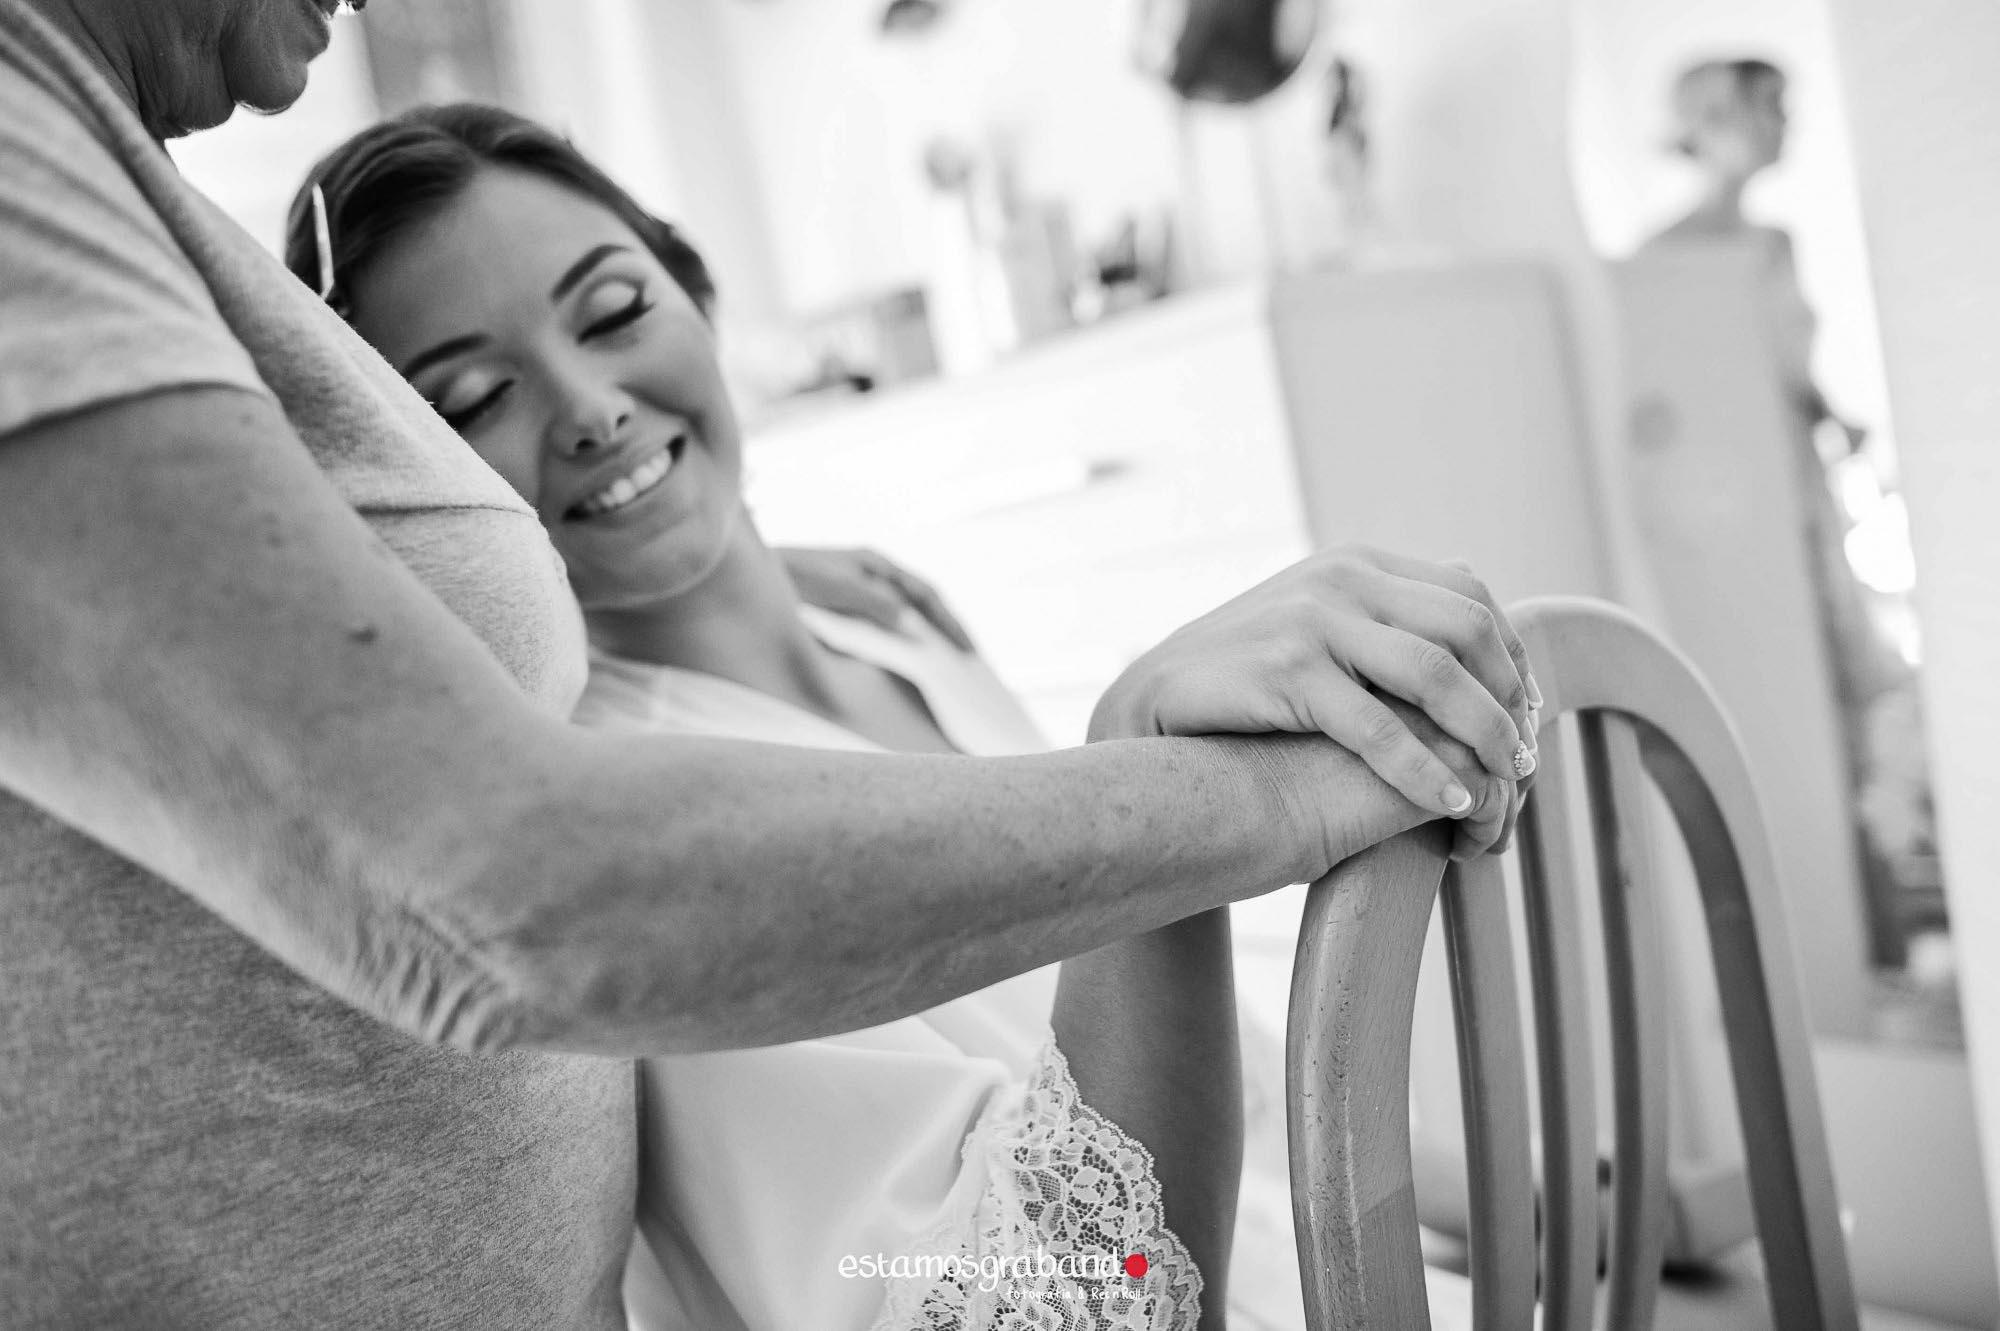 Demo-2017-Fotografía-de-Boda-54 Fotografía de Bodas Recandroller - video boda cadiz